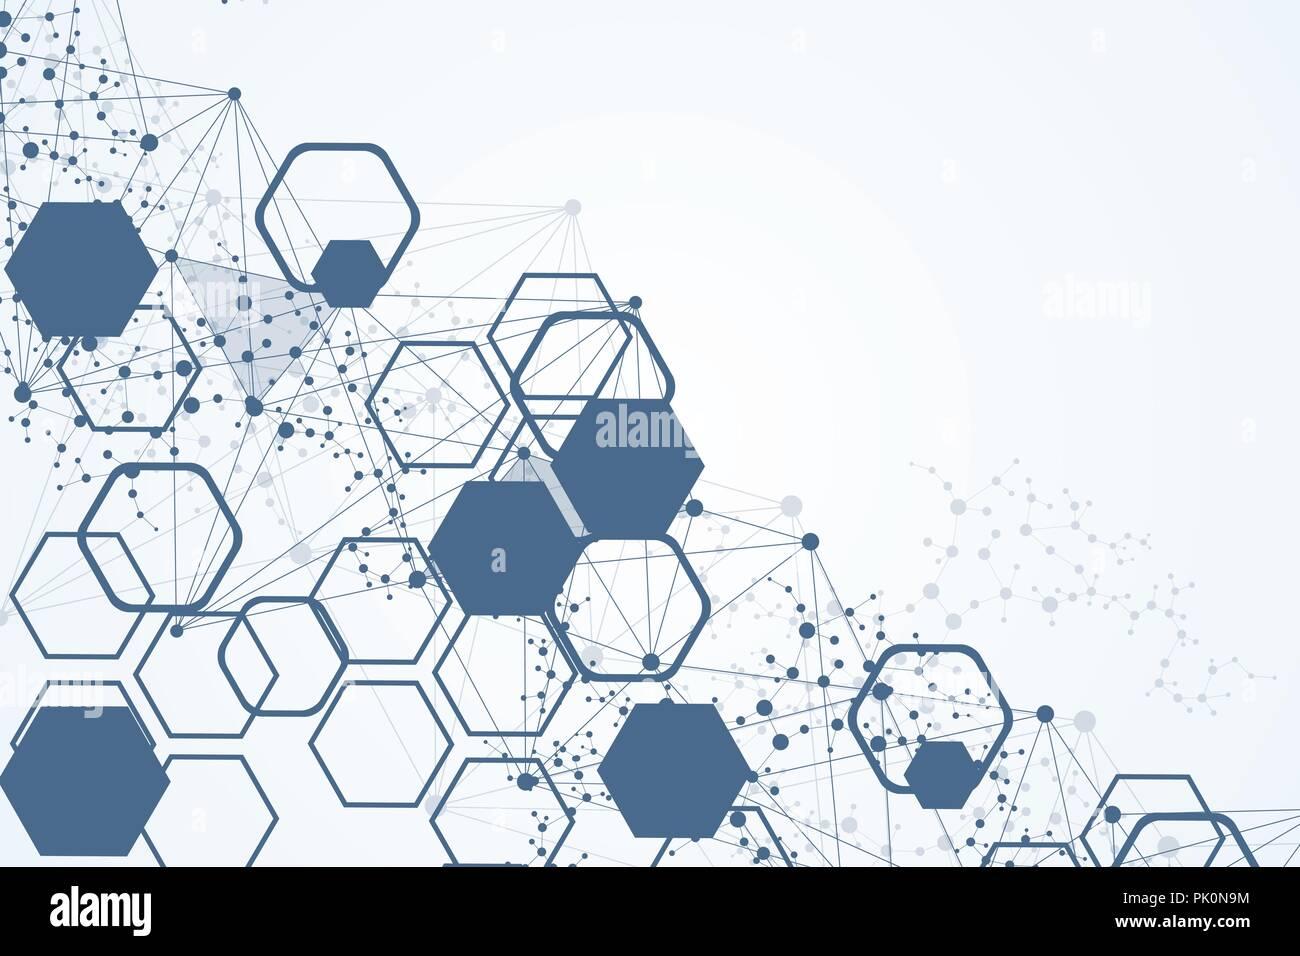 Hexagonal abstract background. Big Data Visualization. Global ...